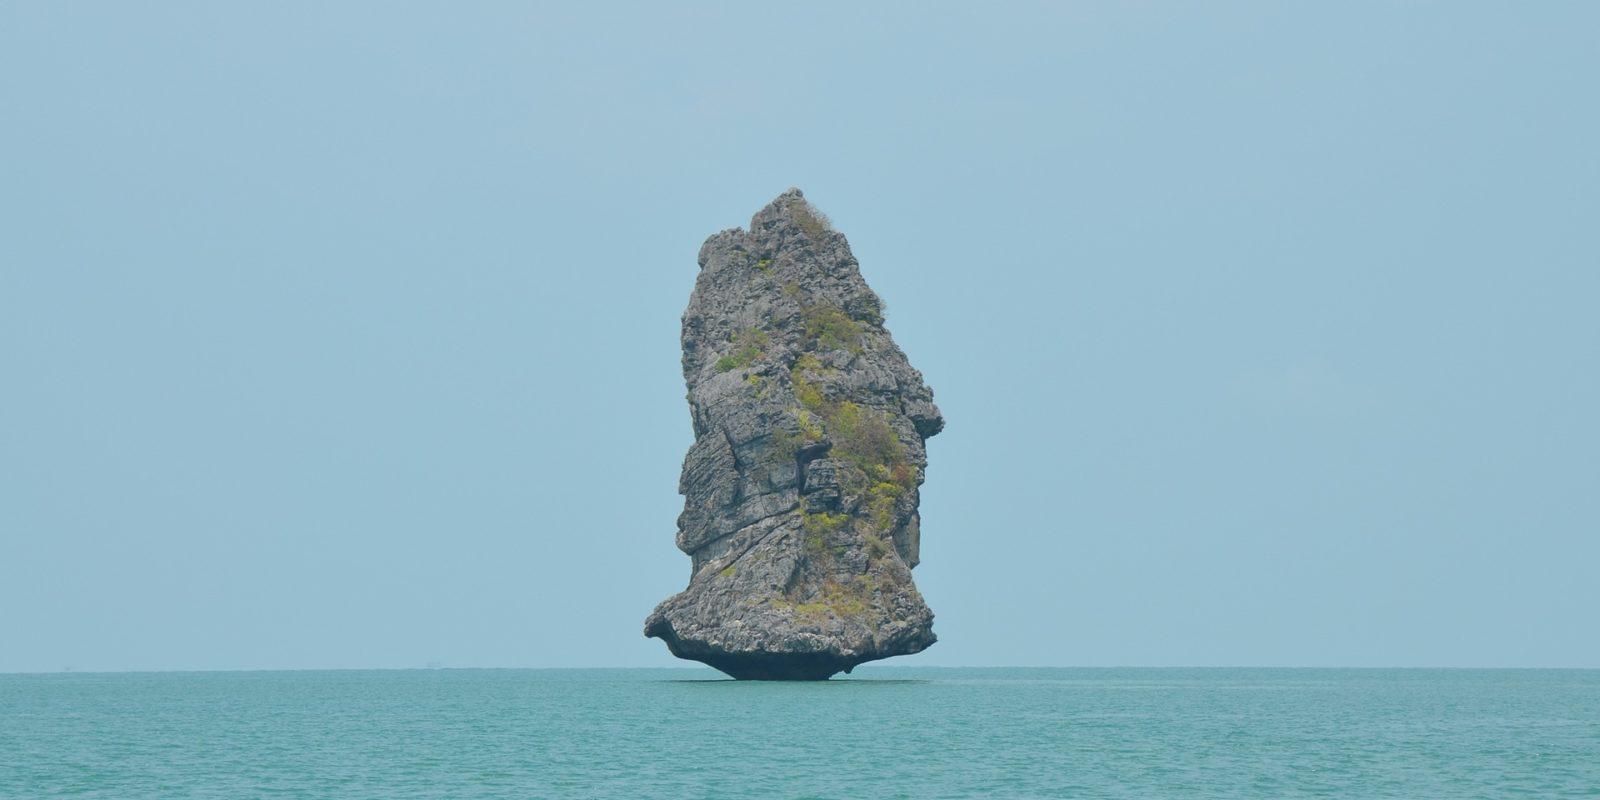 James Bond Island Rock Thailand